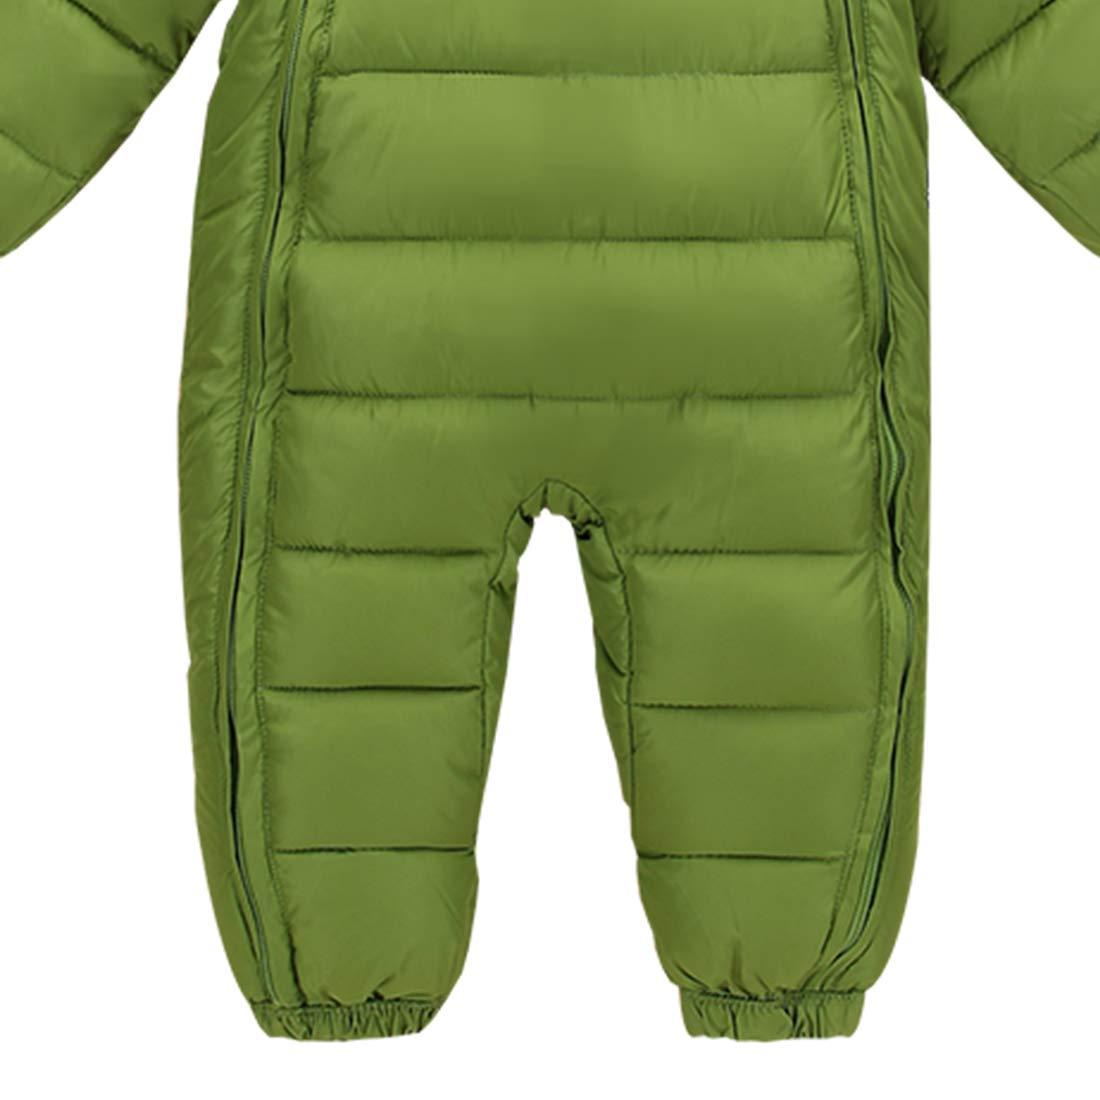 Baby Toddler 3 Piece All in One Snowsuit Romper Snowsuit Zipper Padding Onesie